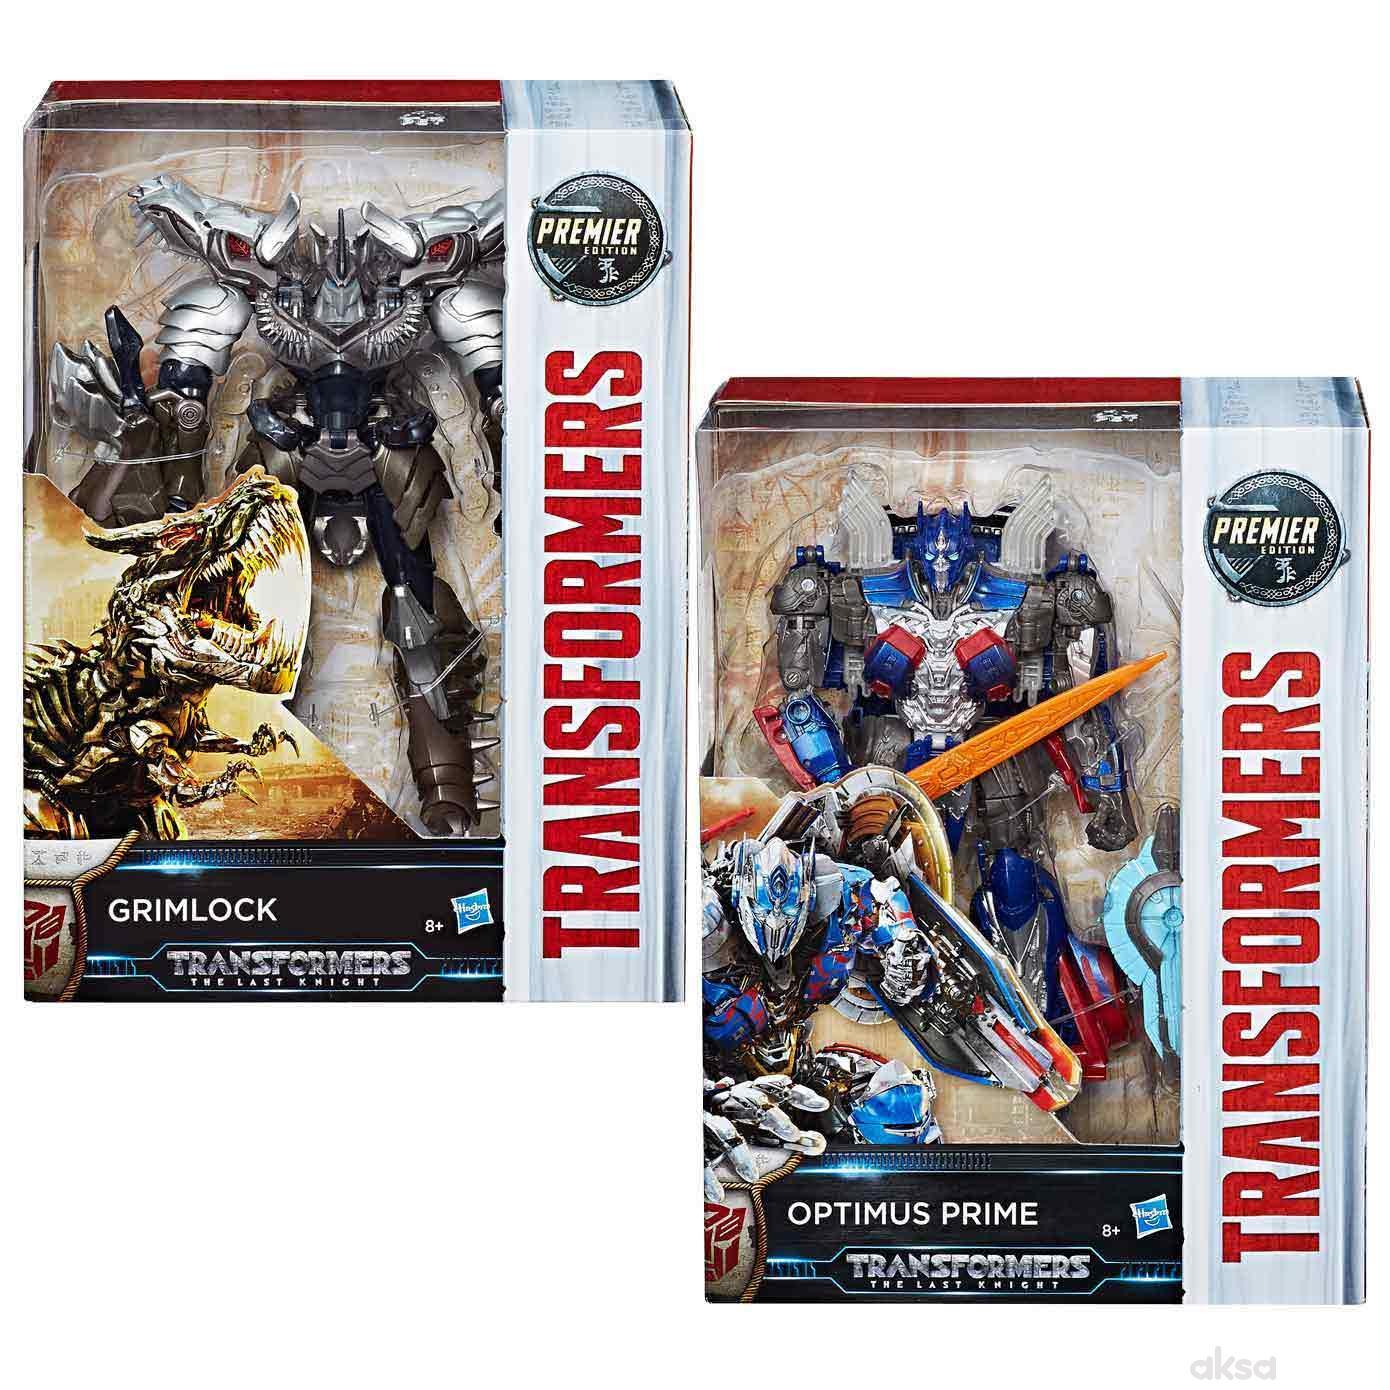 Transformers premier voyager